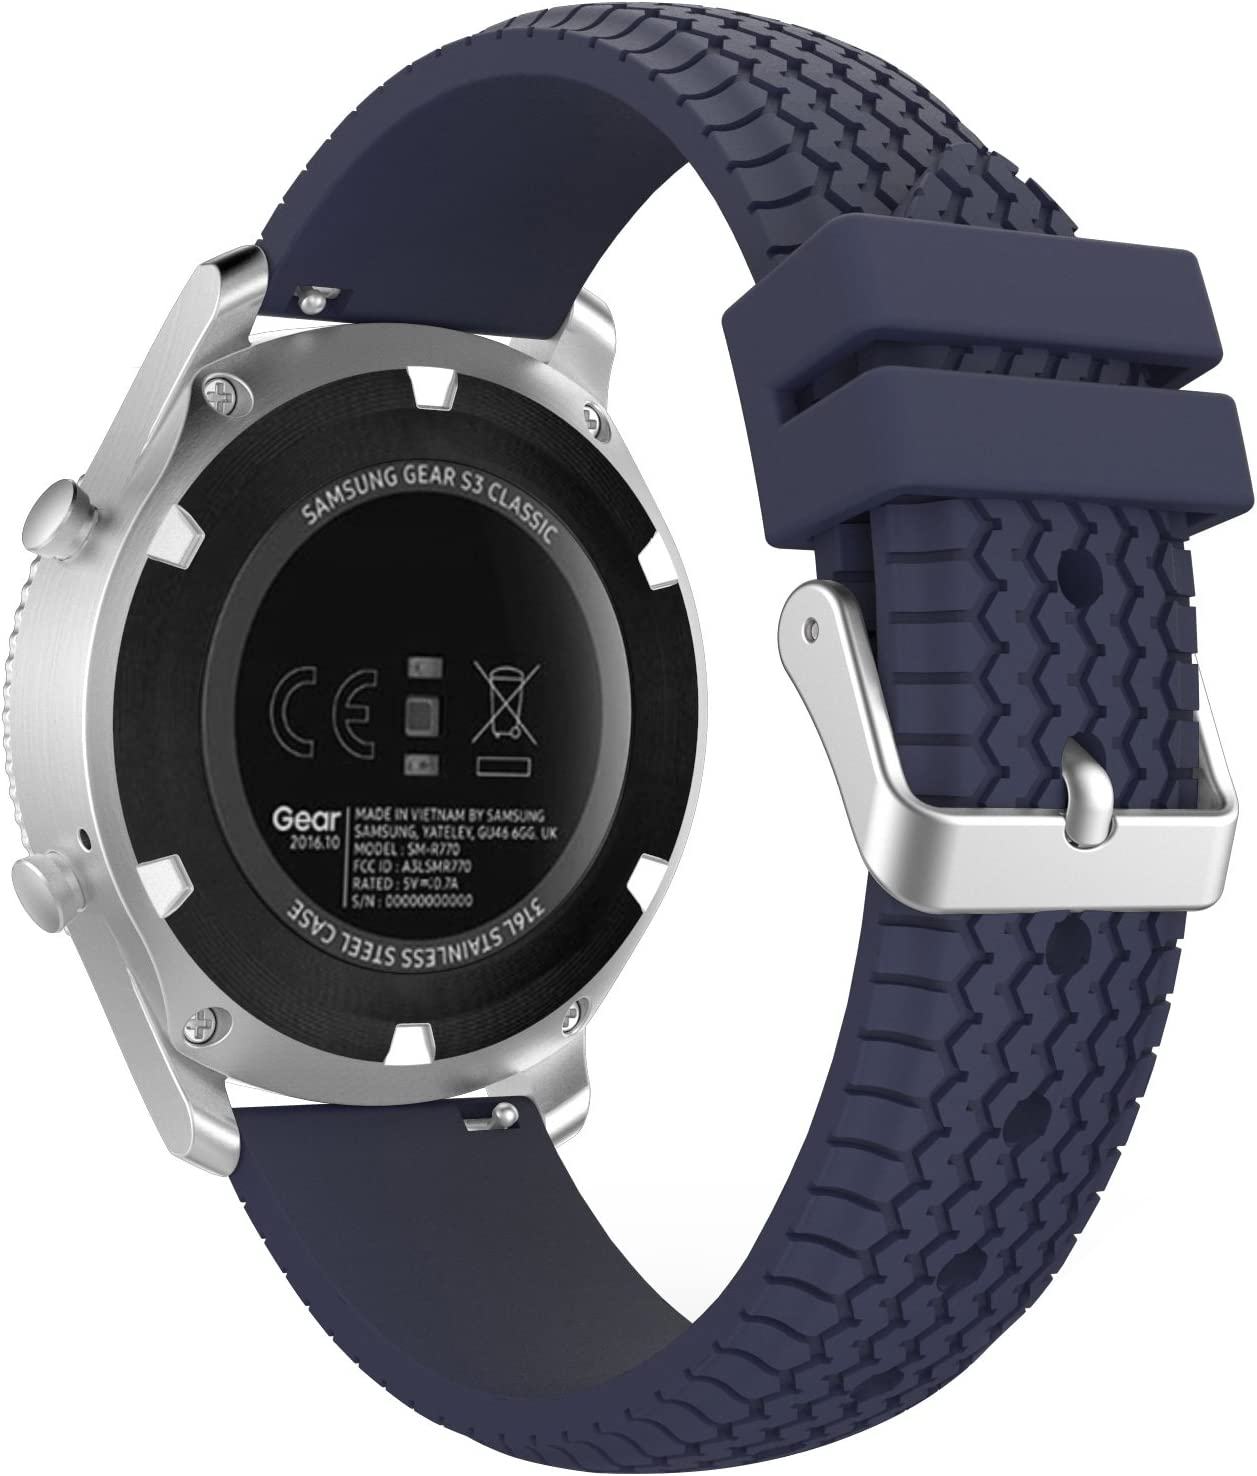 MoKo Samsung Gear S3 Frontier / Galaxy Watch 46mm / Classic Correa, Watch Band Deportiva de Silicona Suave Reemplazo Sport Band para Samsung Galaxy Watch 46mm /S3 Classic Smartwatch, Azul Medianoche: Amazon.es: